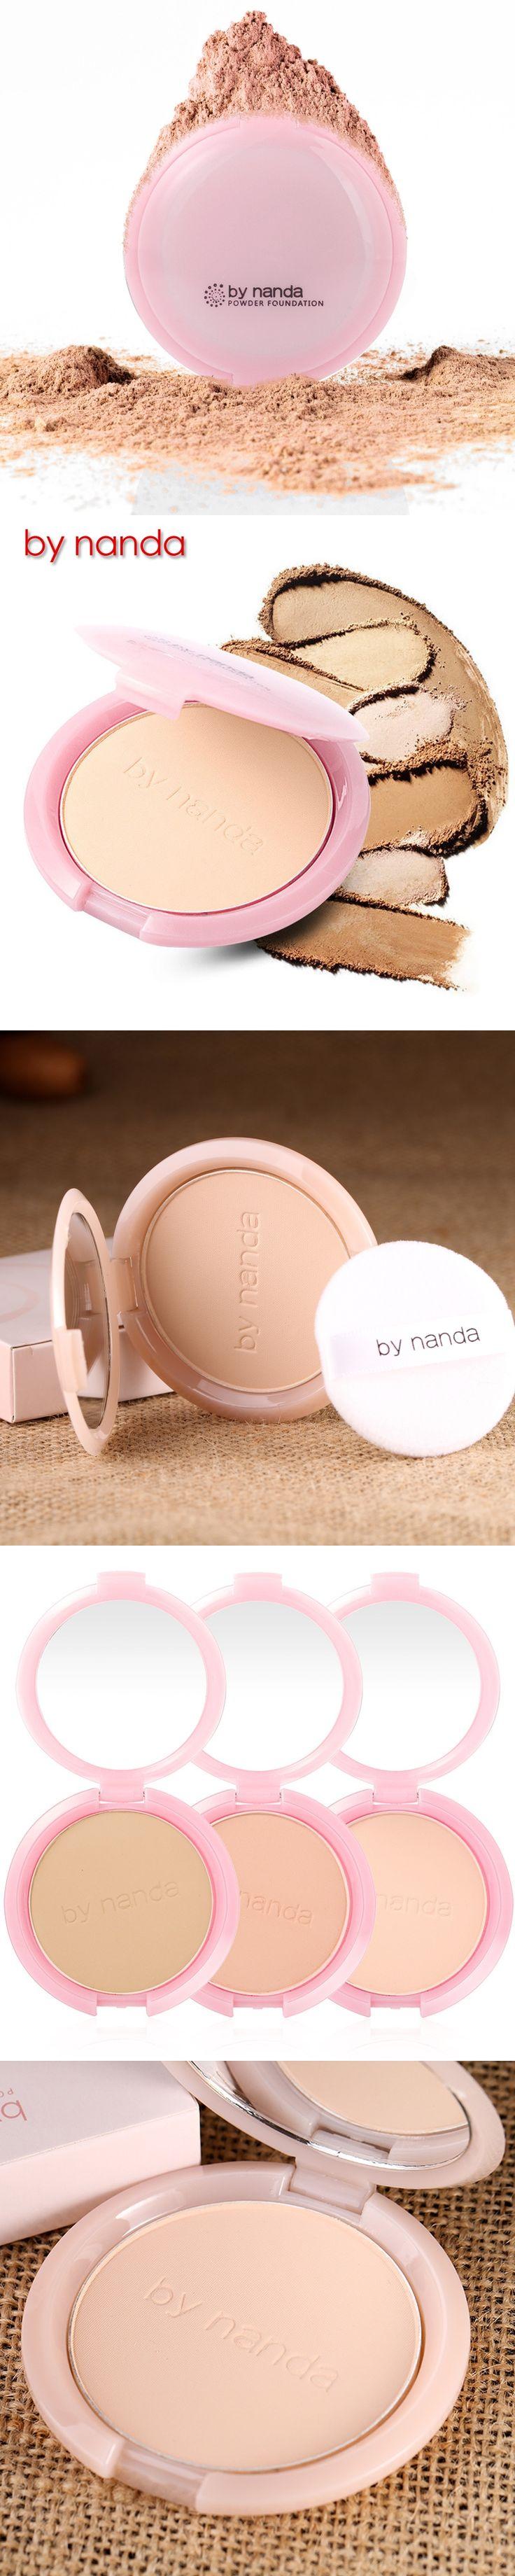 BY NANDA Brand face powder Professional Cosmetic By nanda Studio Fix Powder Plus Foundation Fond De Teint Poudre 8.5g Makeup co.